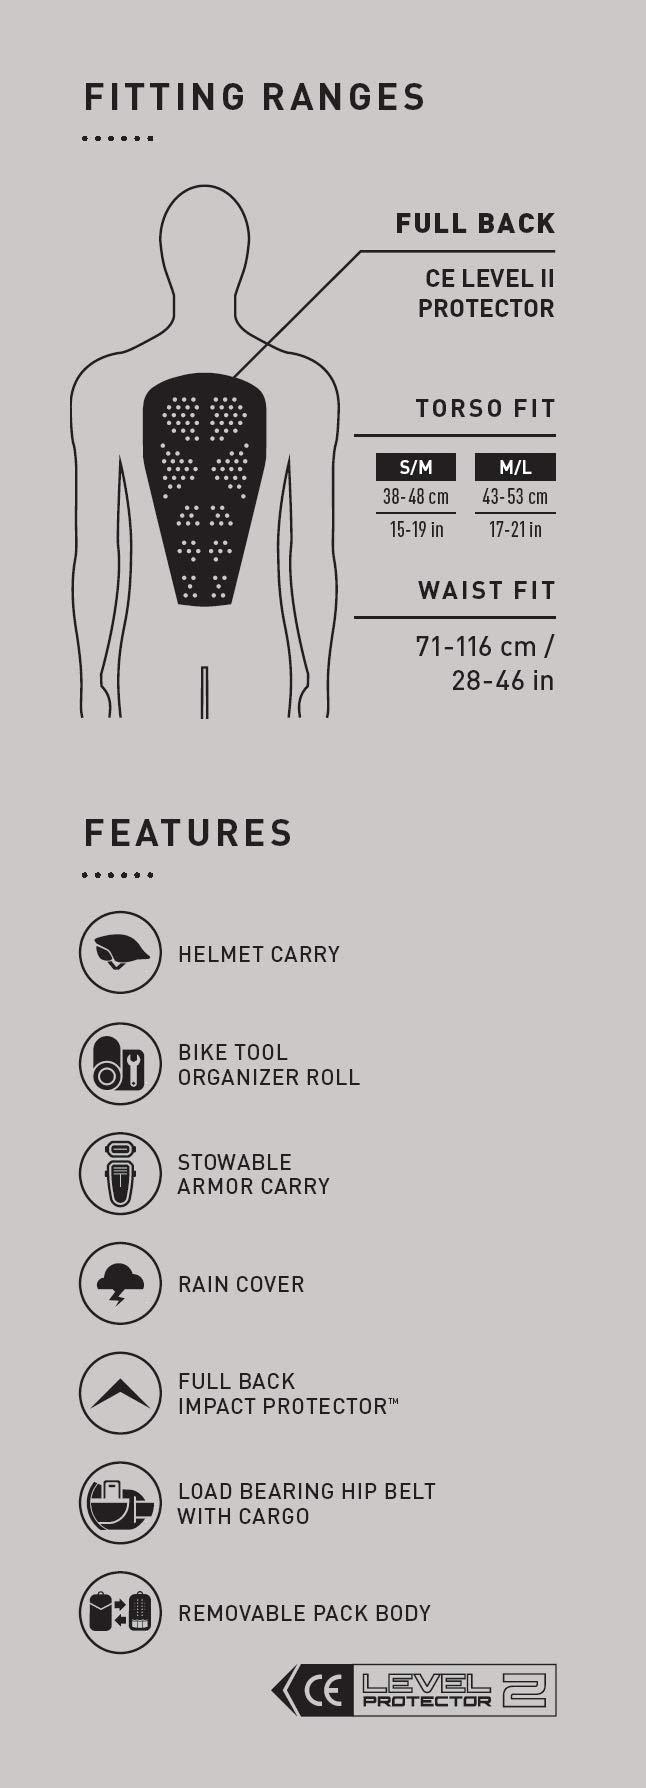 CamelBak Chase Bike Vest 50 oz Hydration Pack, Black by CamelBak (Image #1)